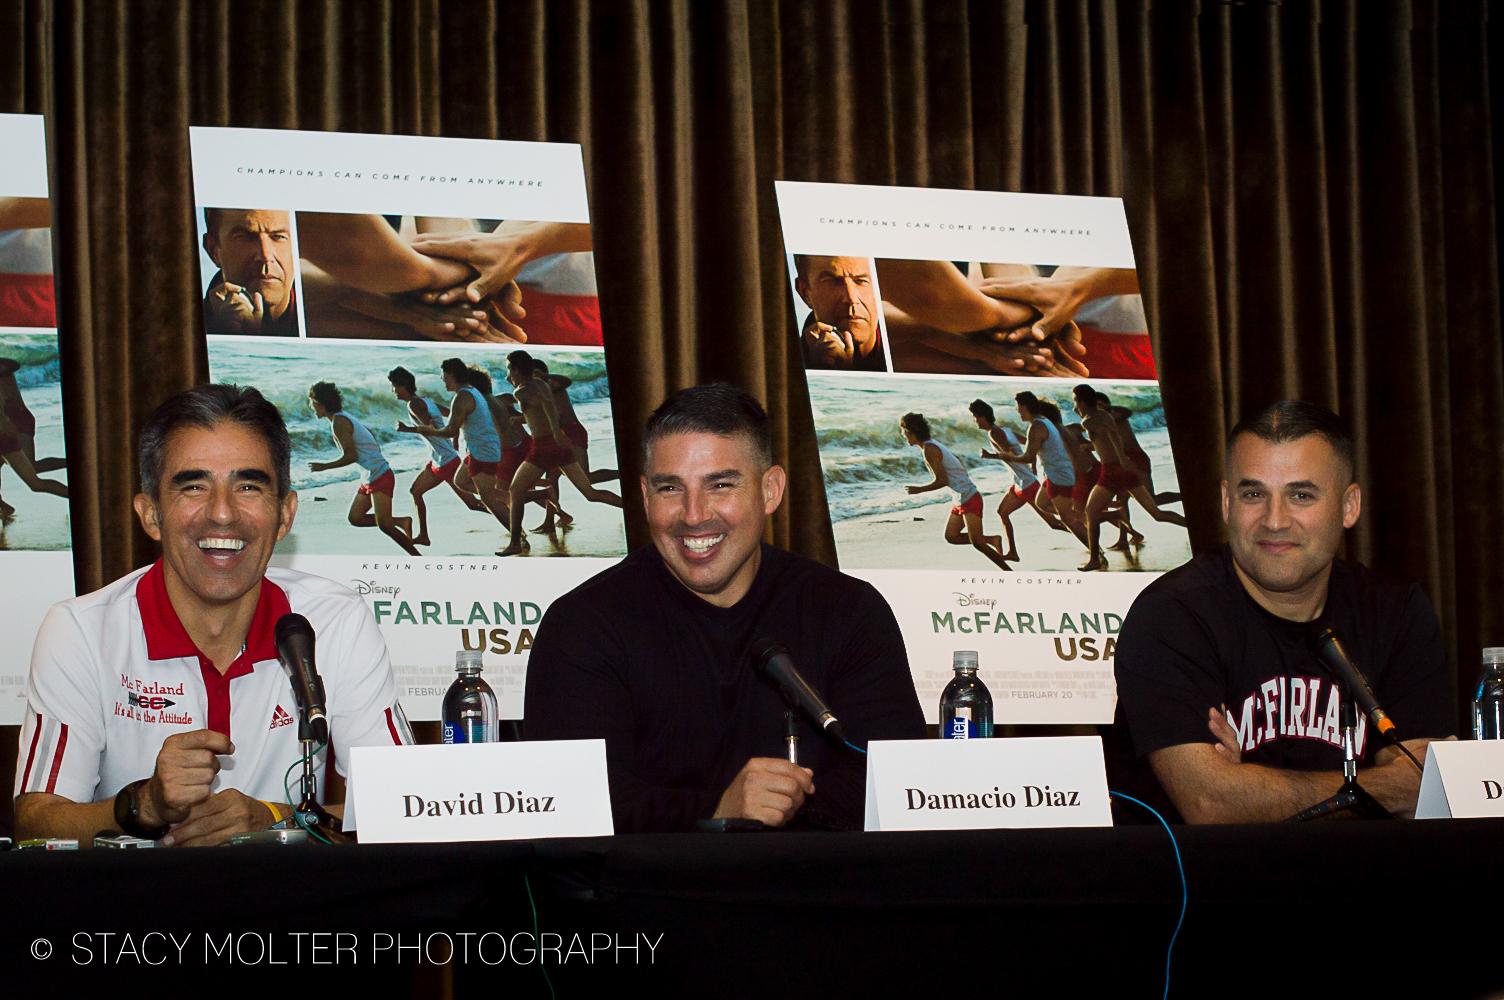 McFarland USA Press Conference Q&A – Part 2